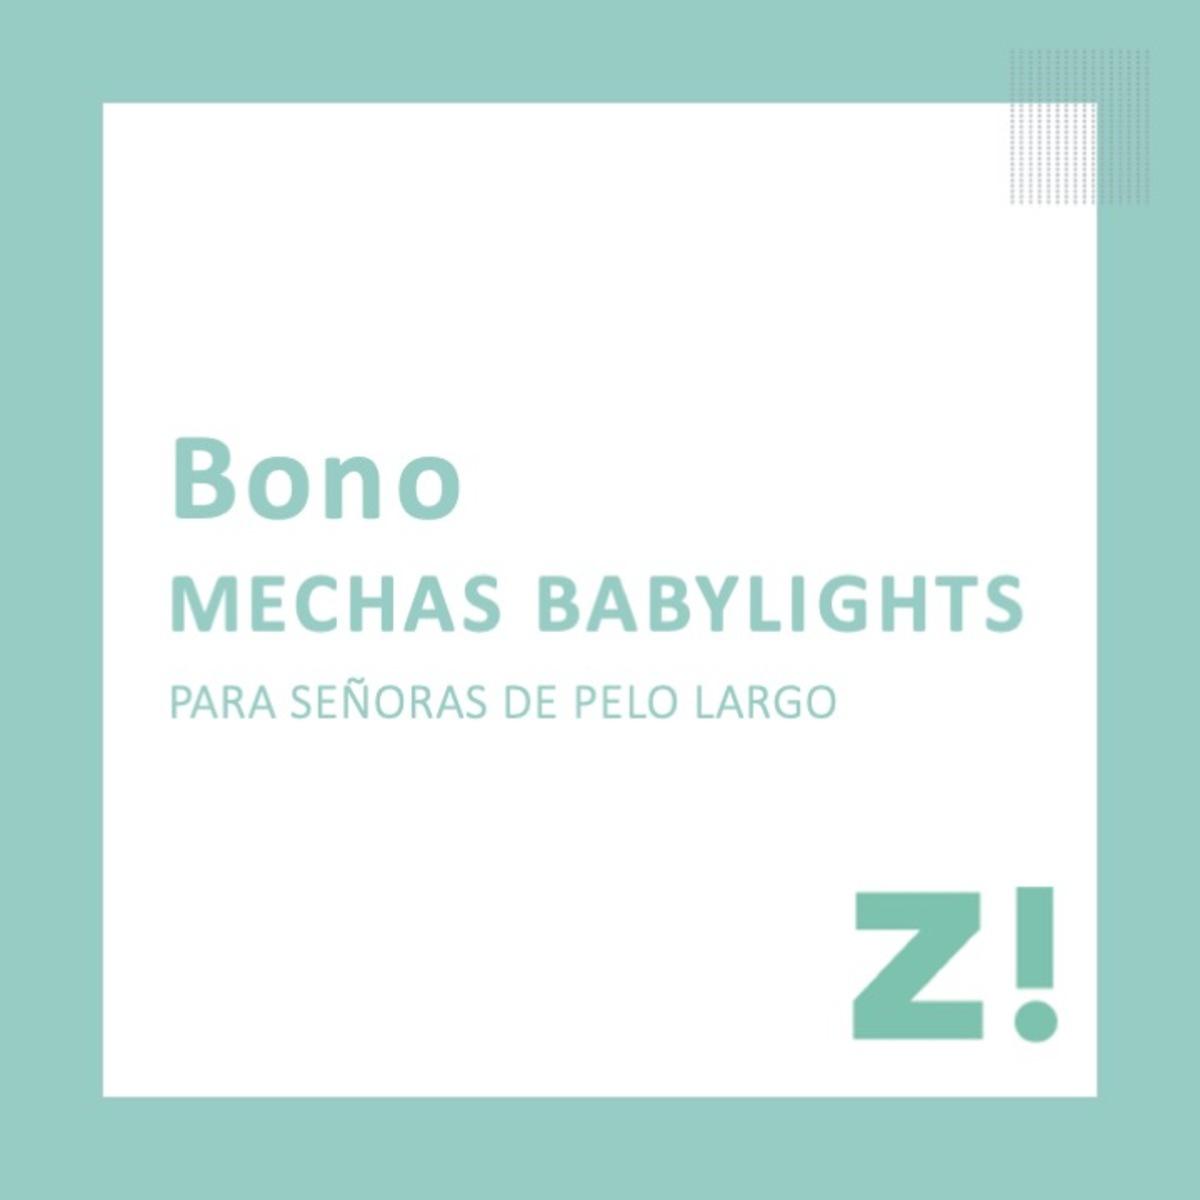 Bono mechas babylights para pelo largo PARA CANJEAR EN PASSARÓ PLAZA SAN BRIZ